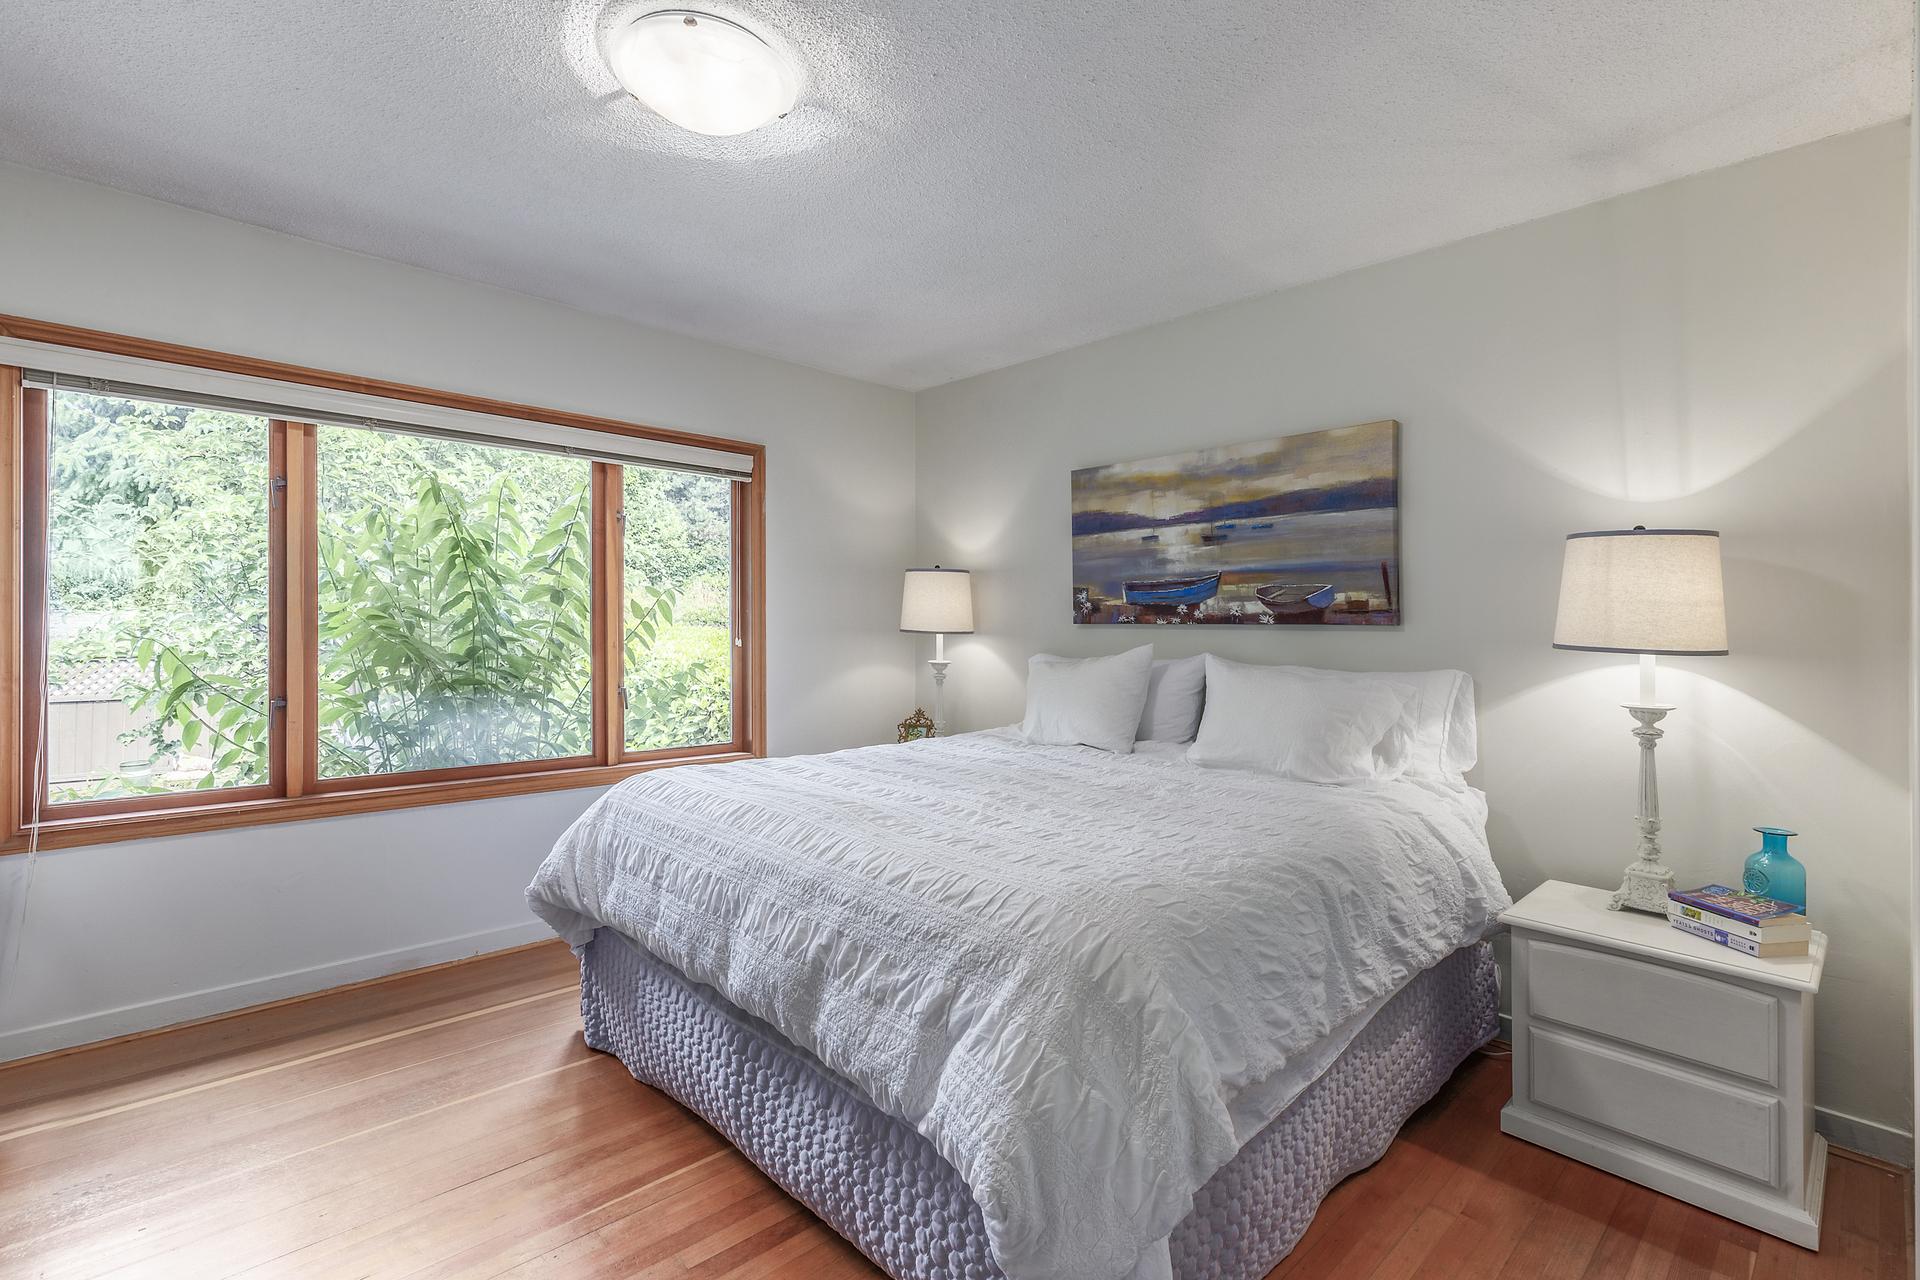 2062-haywood-ave-360hometours-15 at 2062 Haywood Avenue, Ambleside, West Vancouver